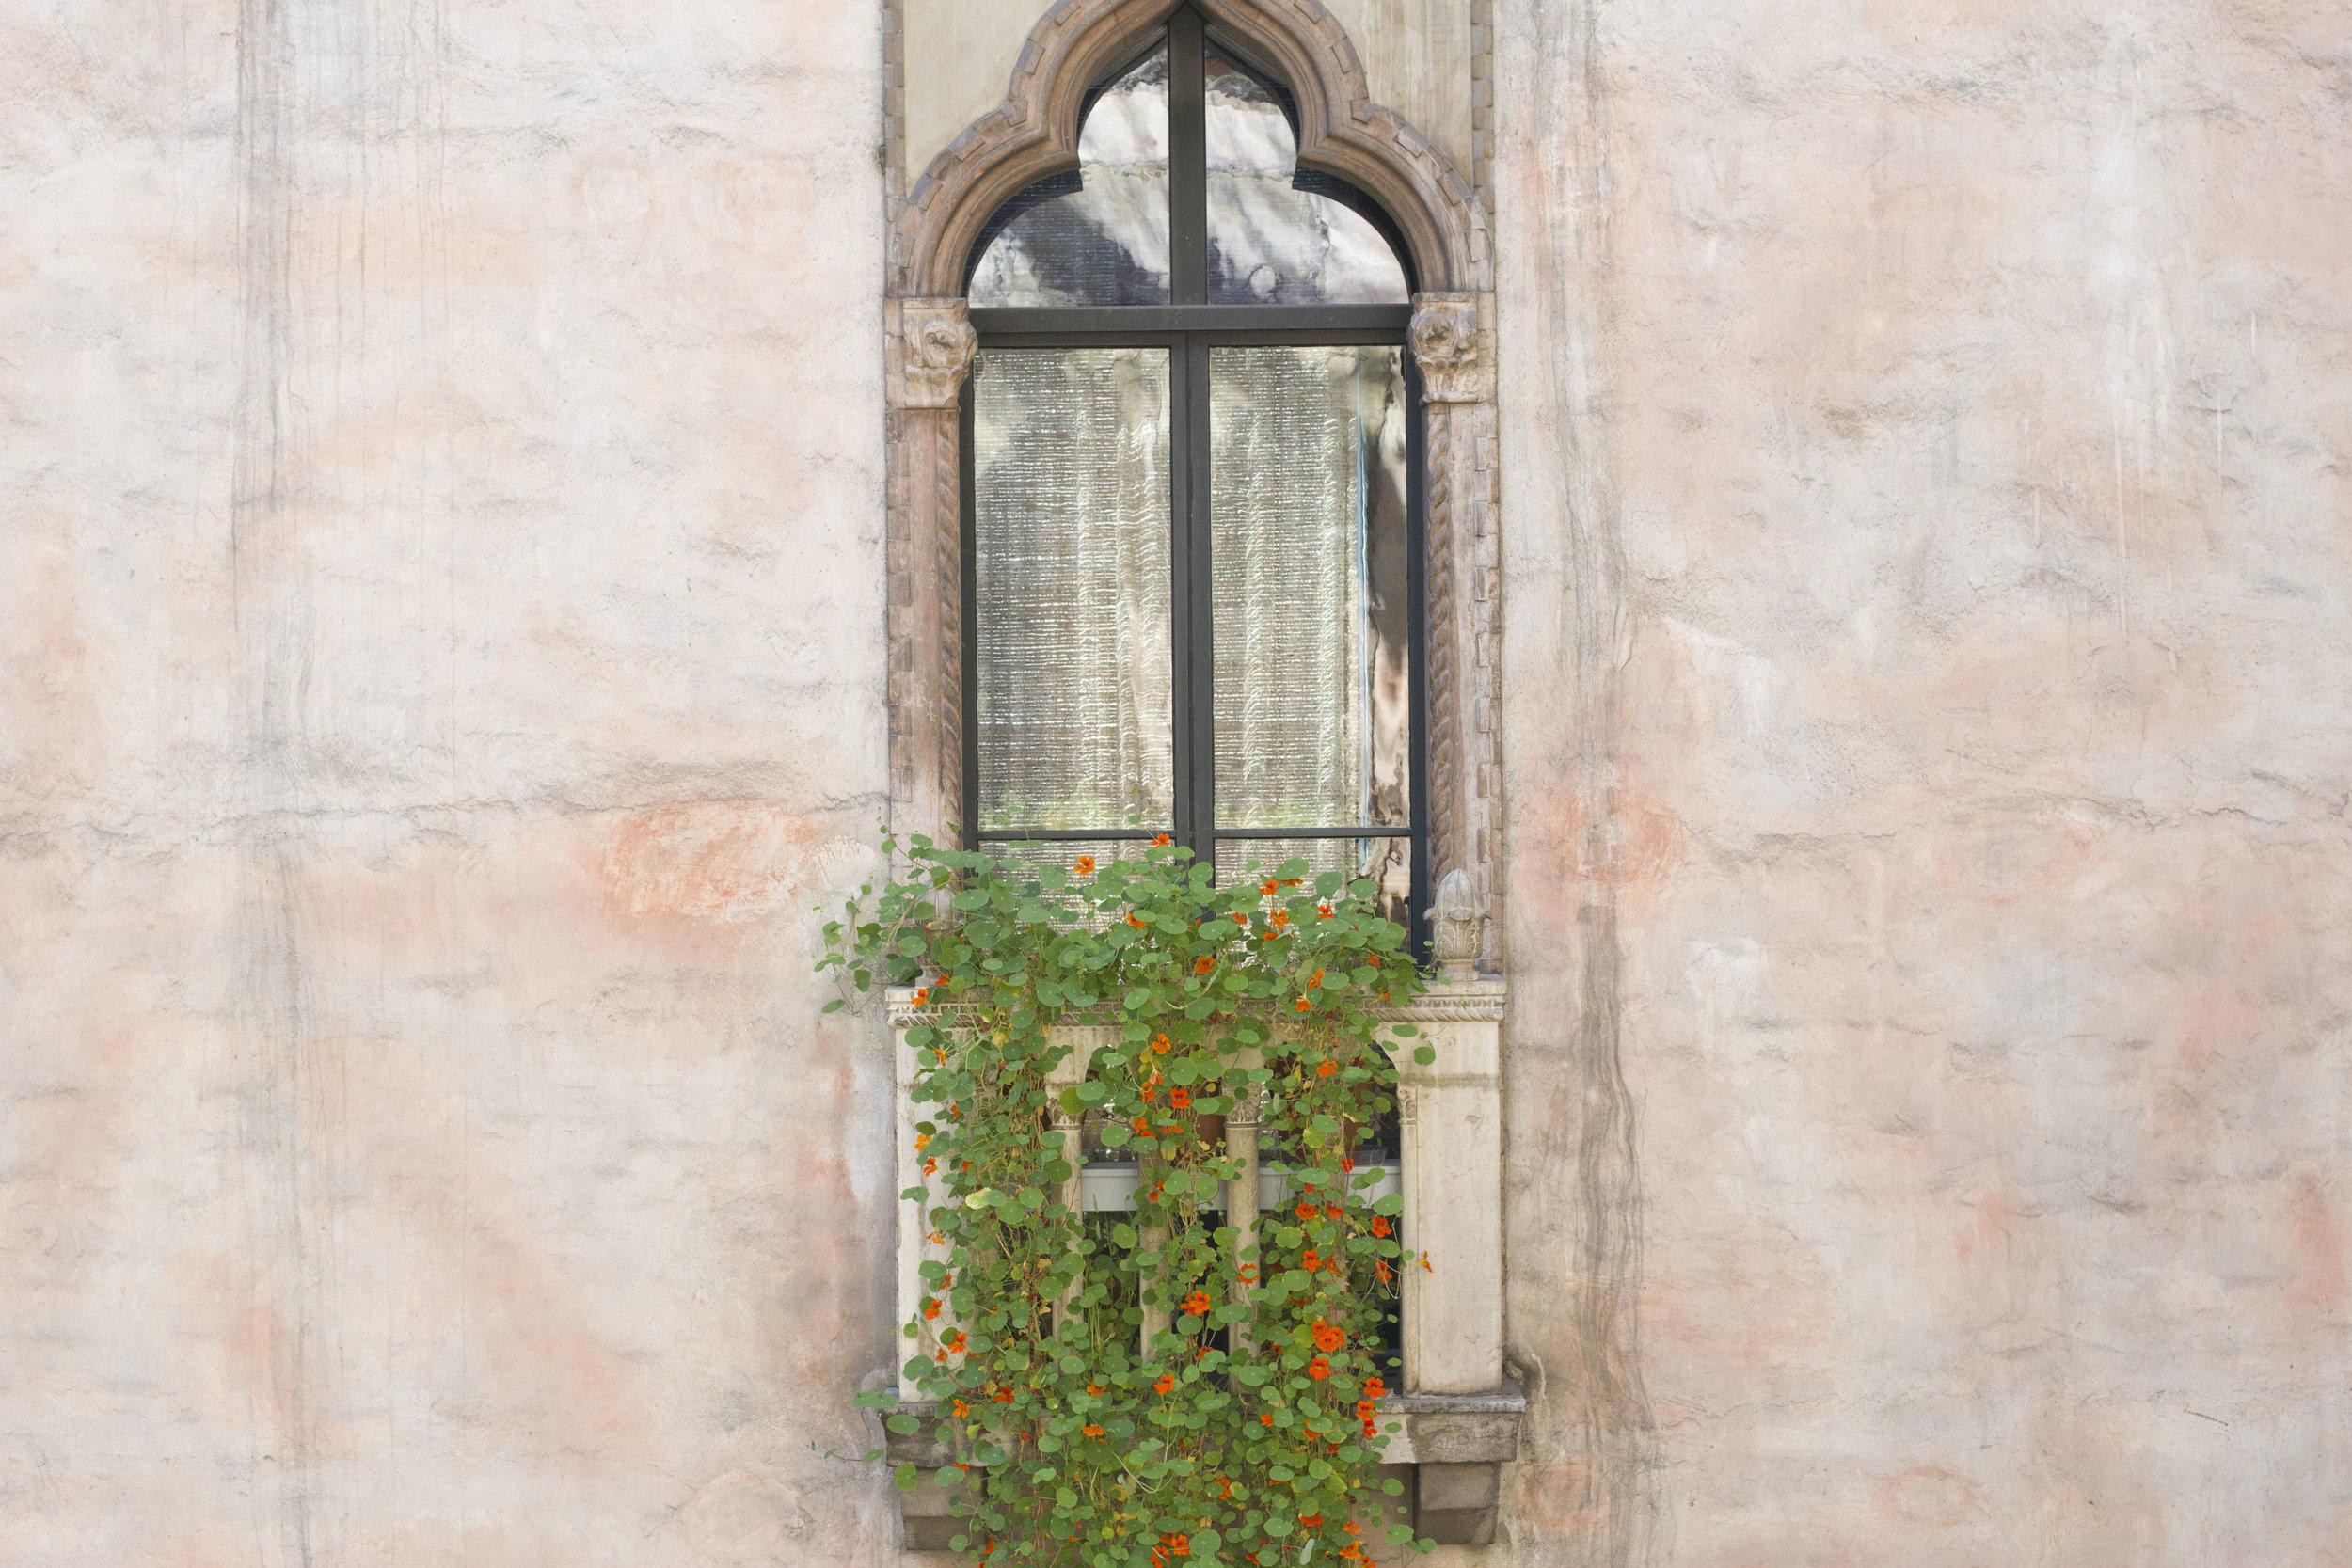 courtyard windows and vine.jpg